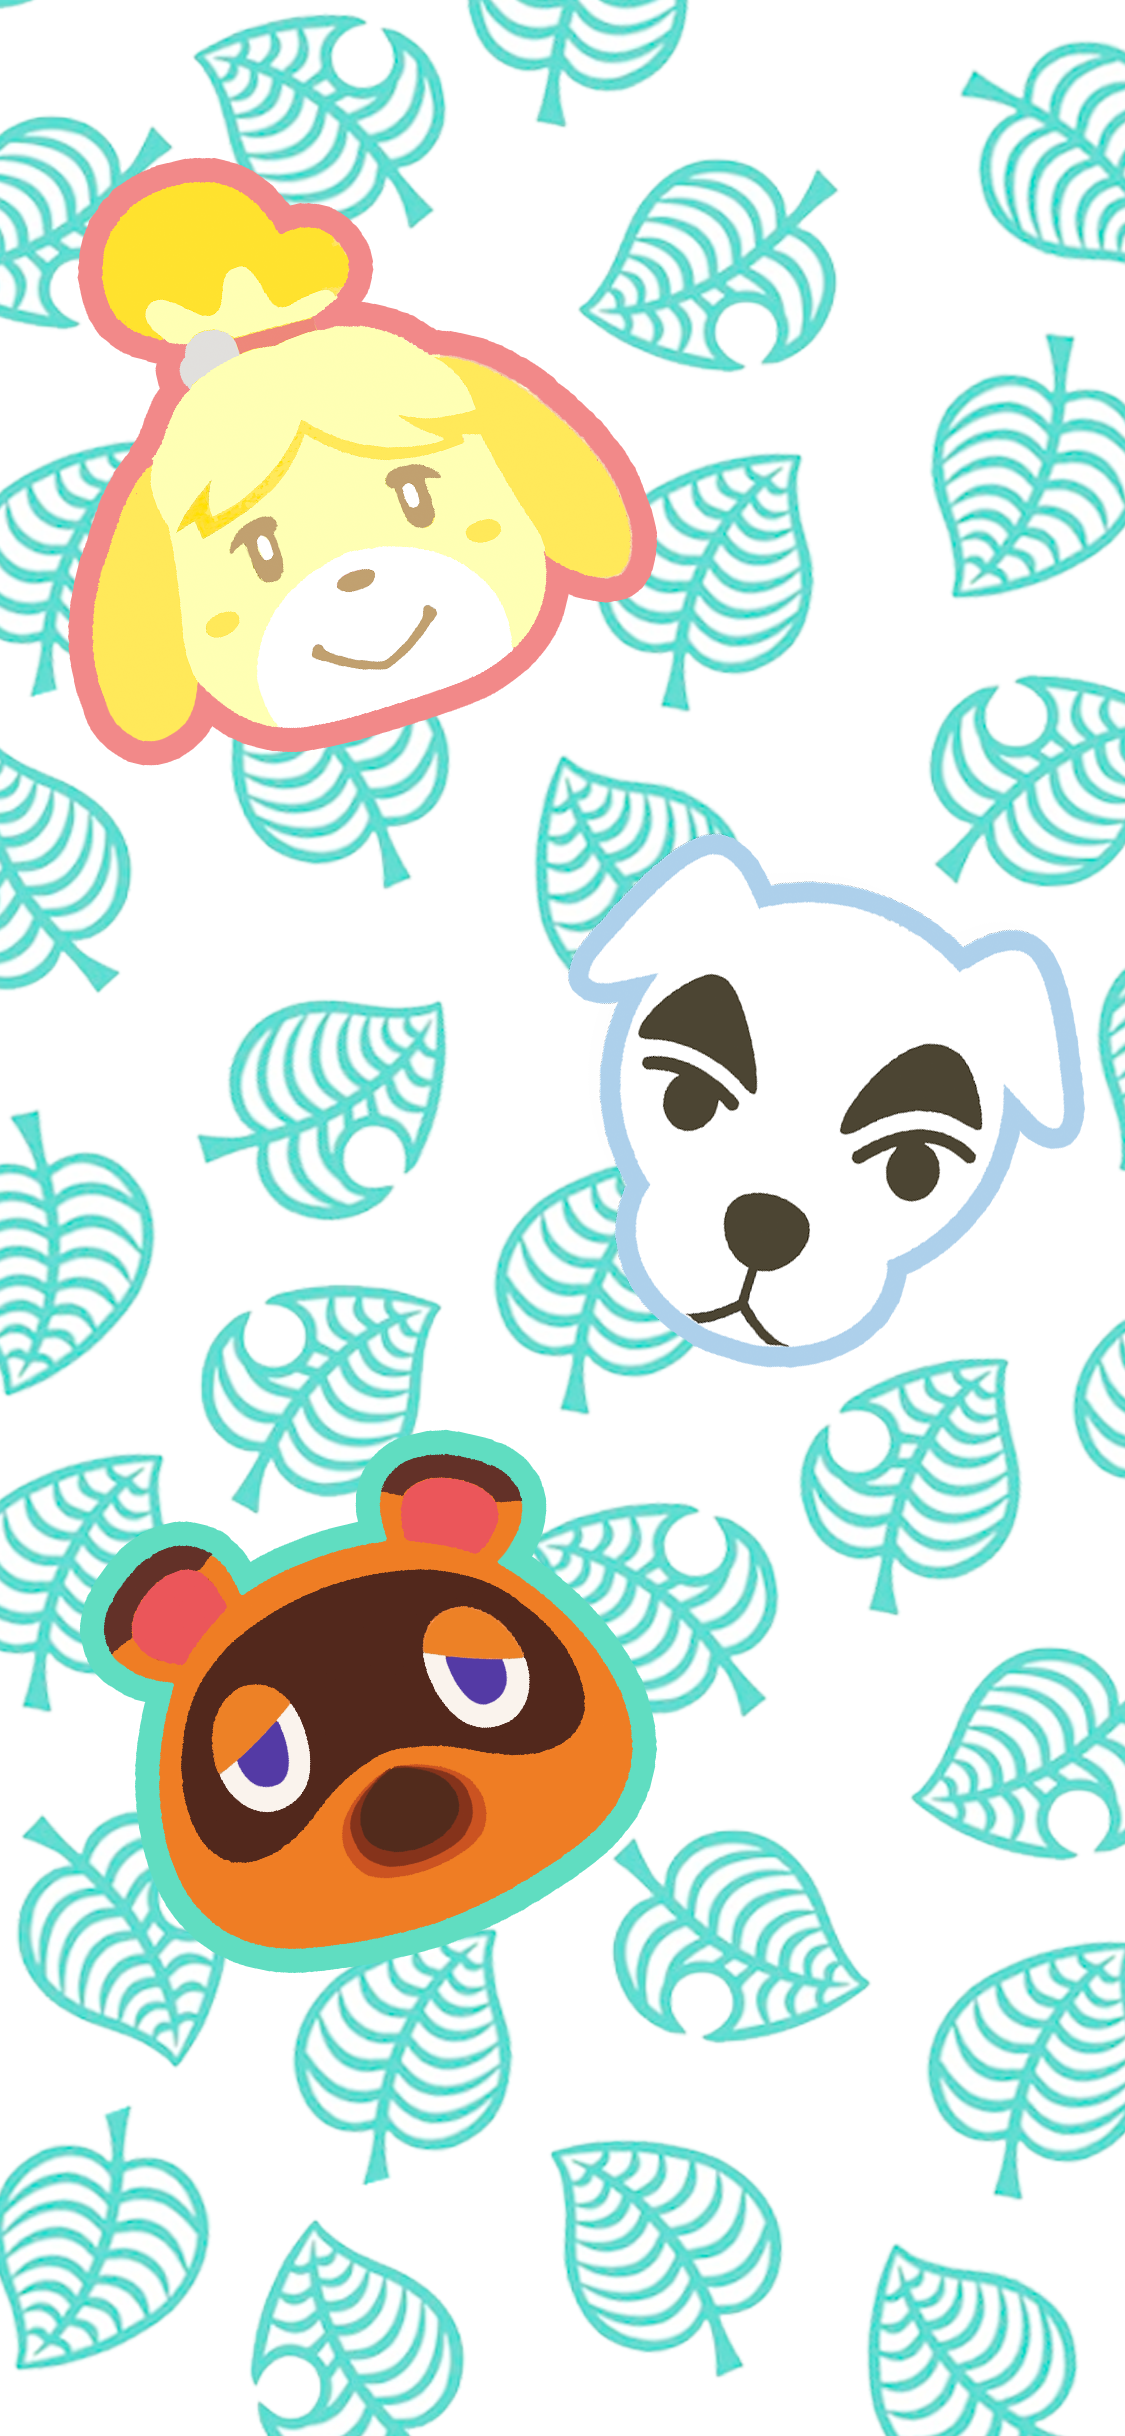 Animal Crossing New Horizons Mobile Und Desktop Hintergrunde Acpocketnews Animal Crossing Animal Wallpaper Cute Animals